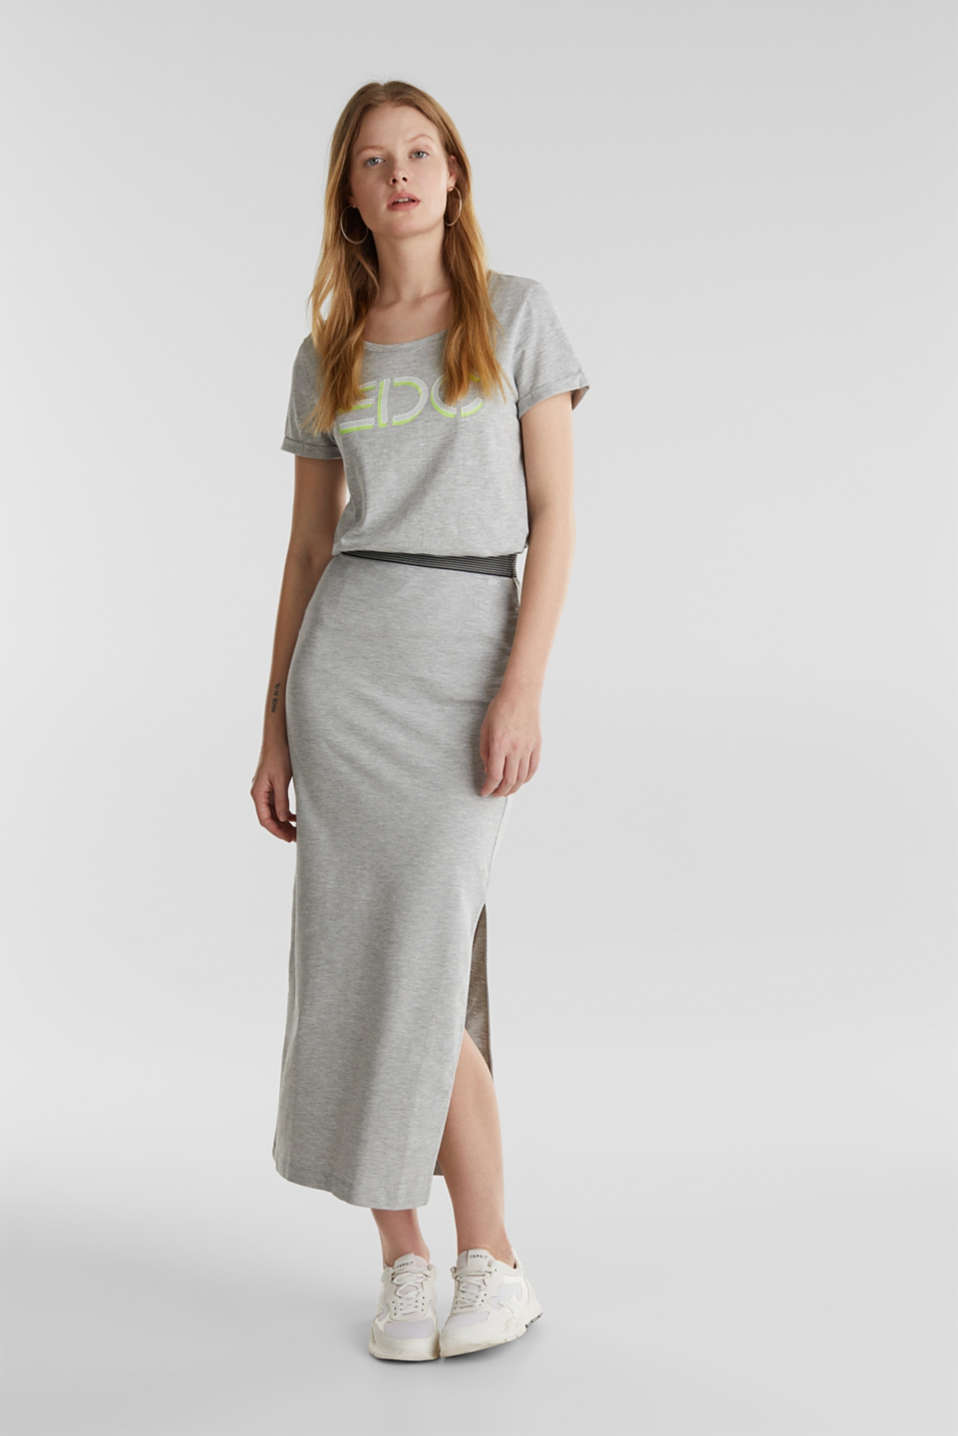 Stretch jersey skirt, LIGHT GREY 5, detail image number 1